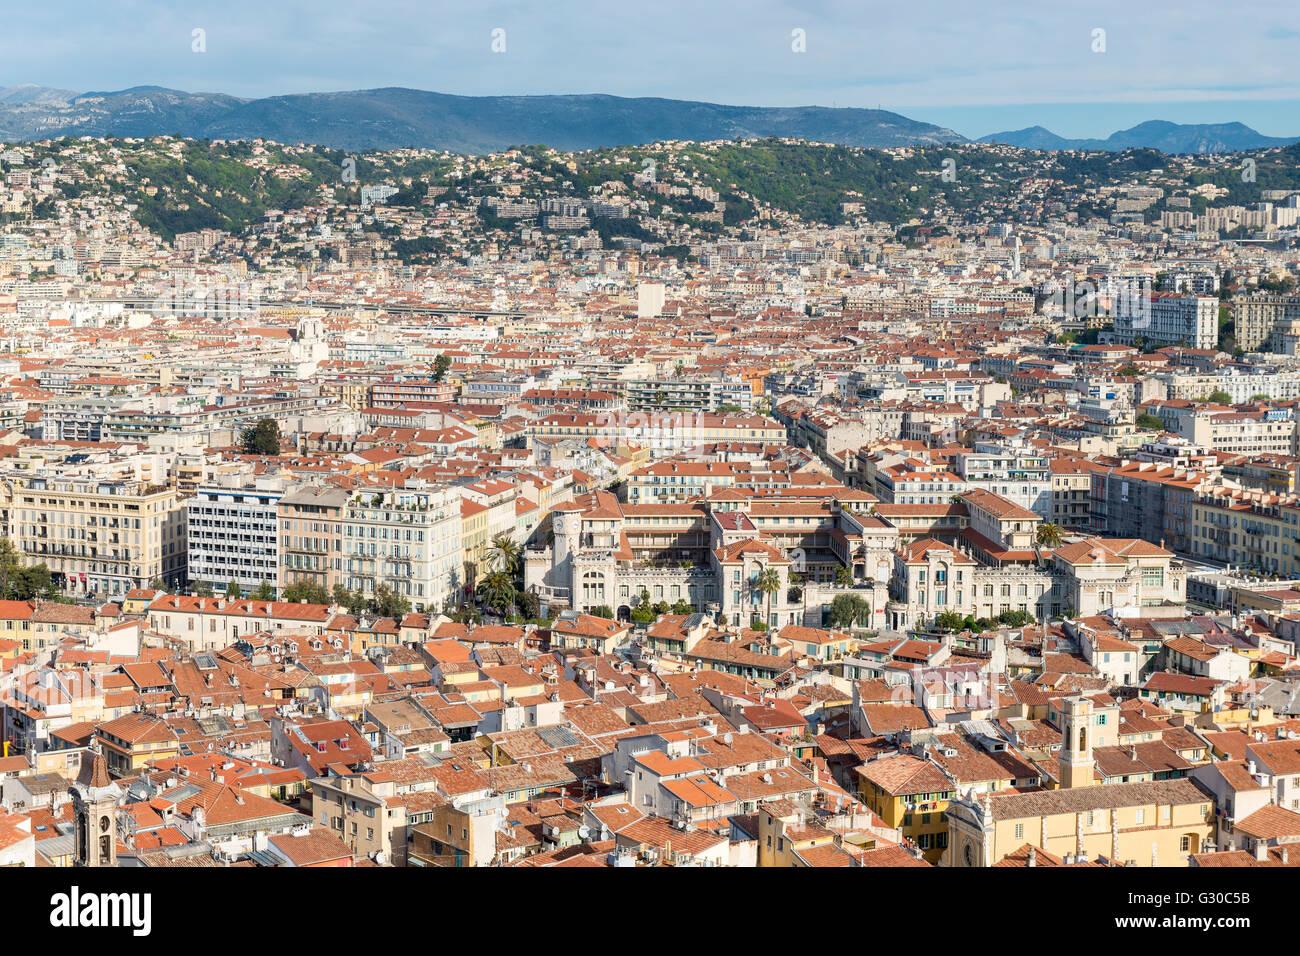 Stadtbild-Skyline-Blick über die Stadt von Nizza, Alpes Maritimes, Provence, Cote d ' Azur, Côte d Stockbild